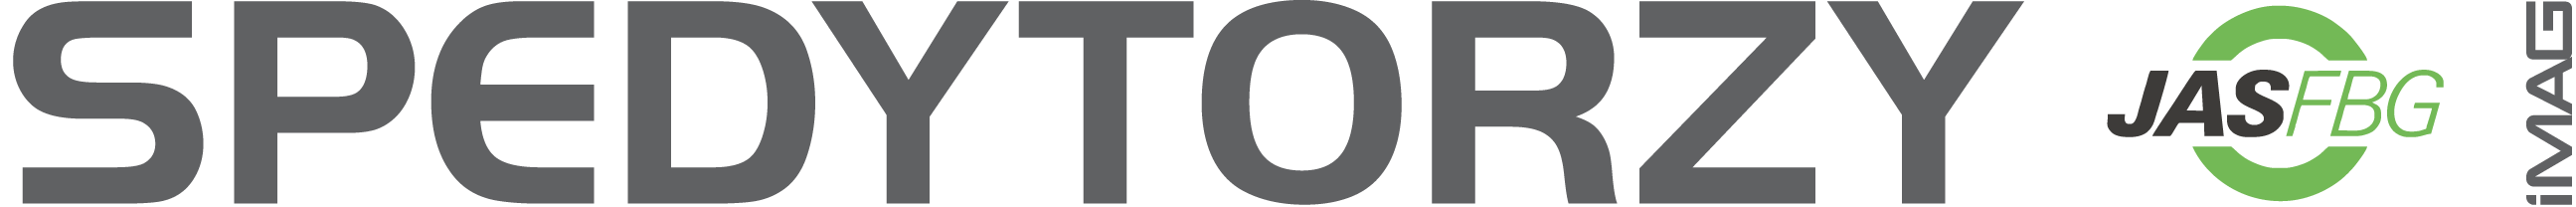 jasfgb - logo